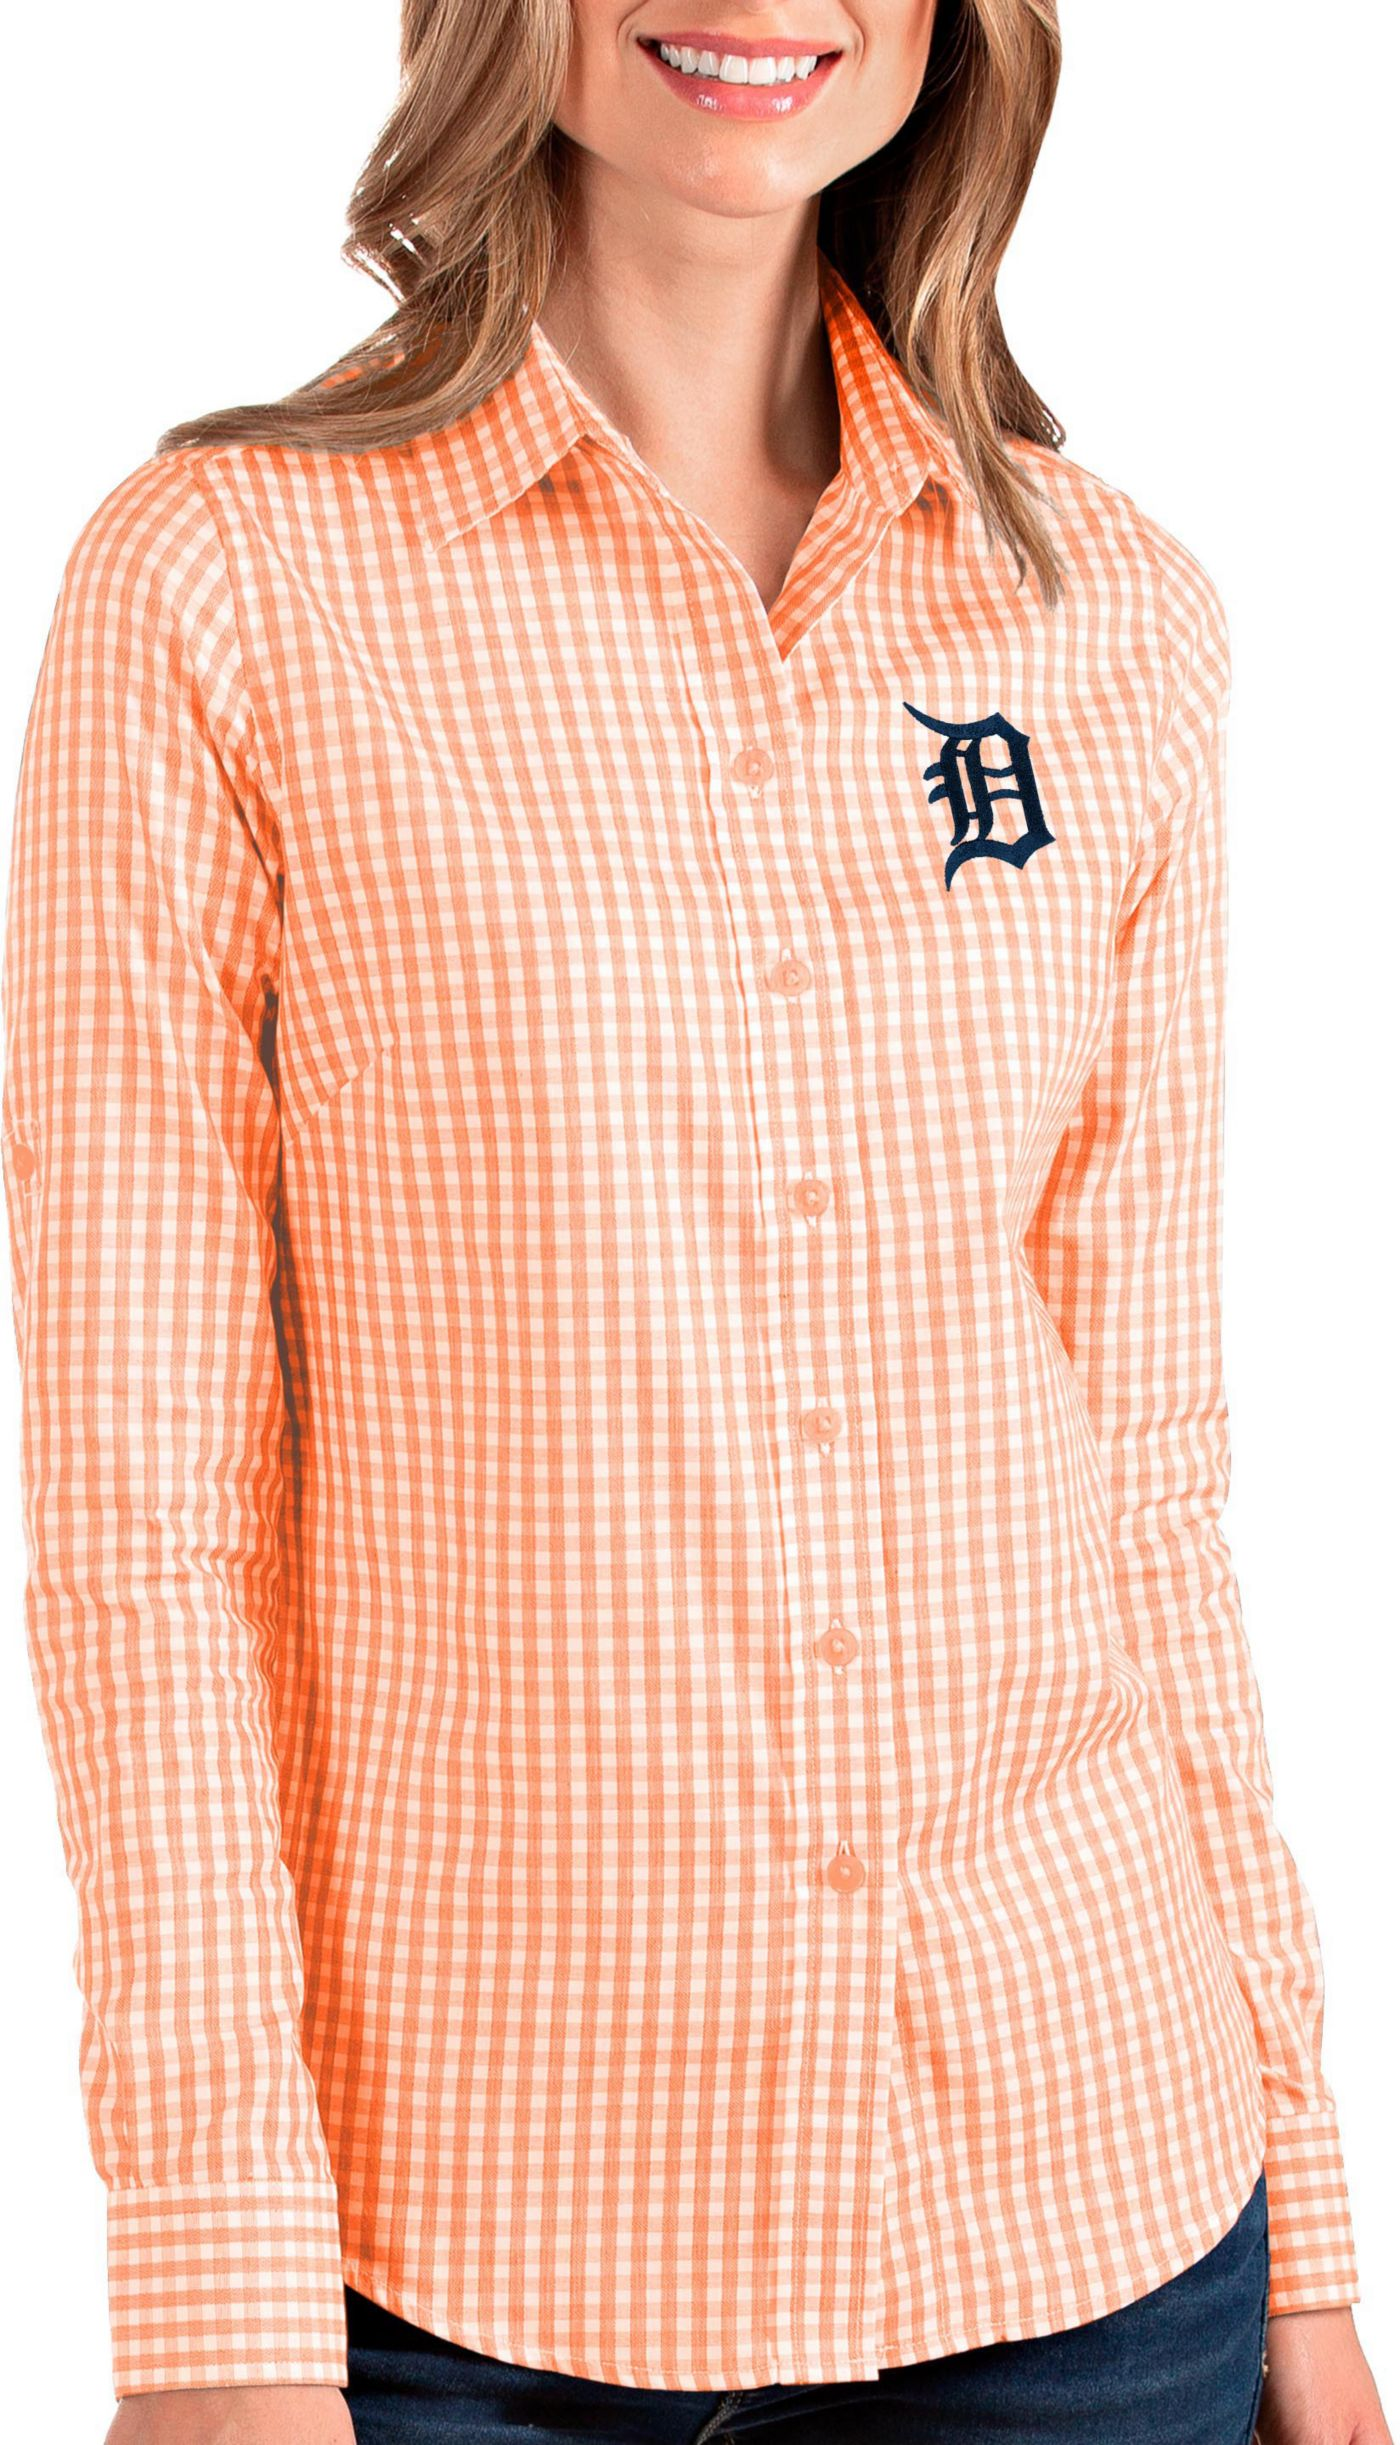 Antigua Women's Detroit Tigers Structure Button-Up Orange Long Sleeve Shirt